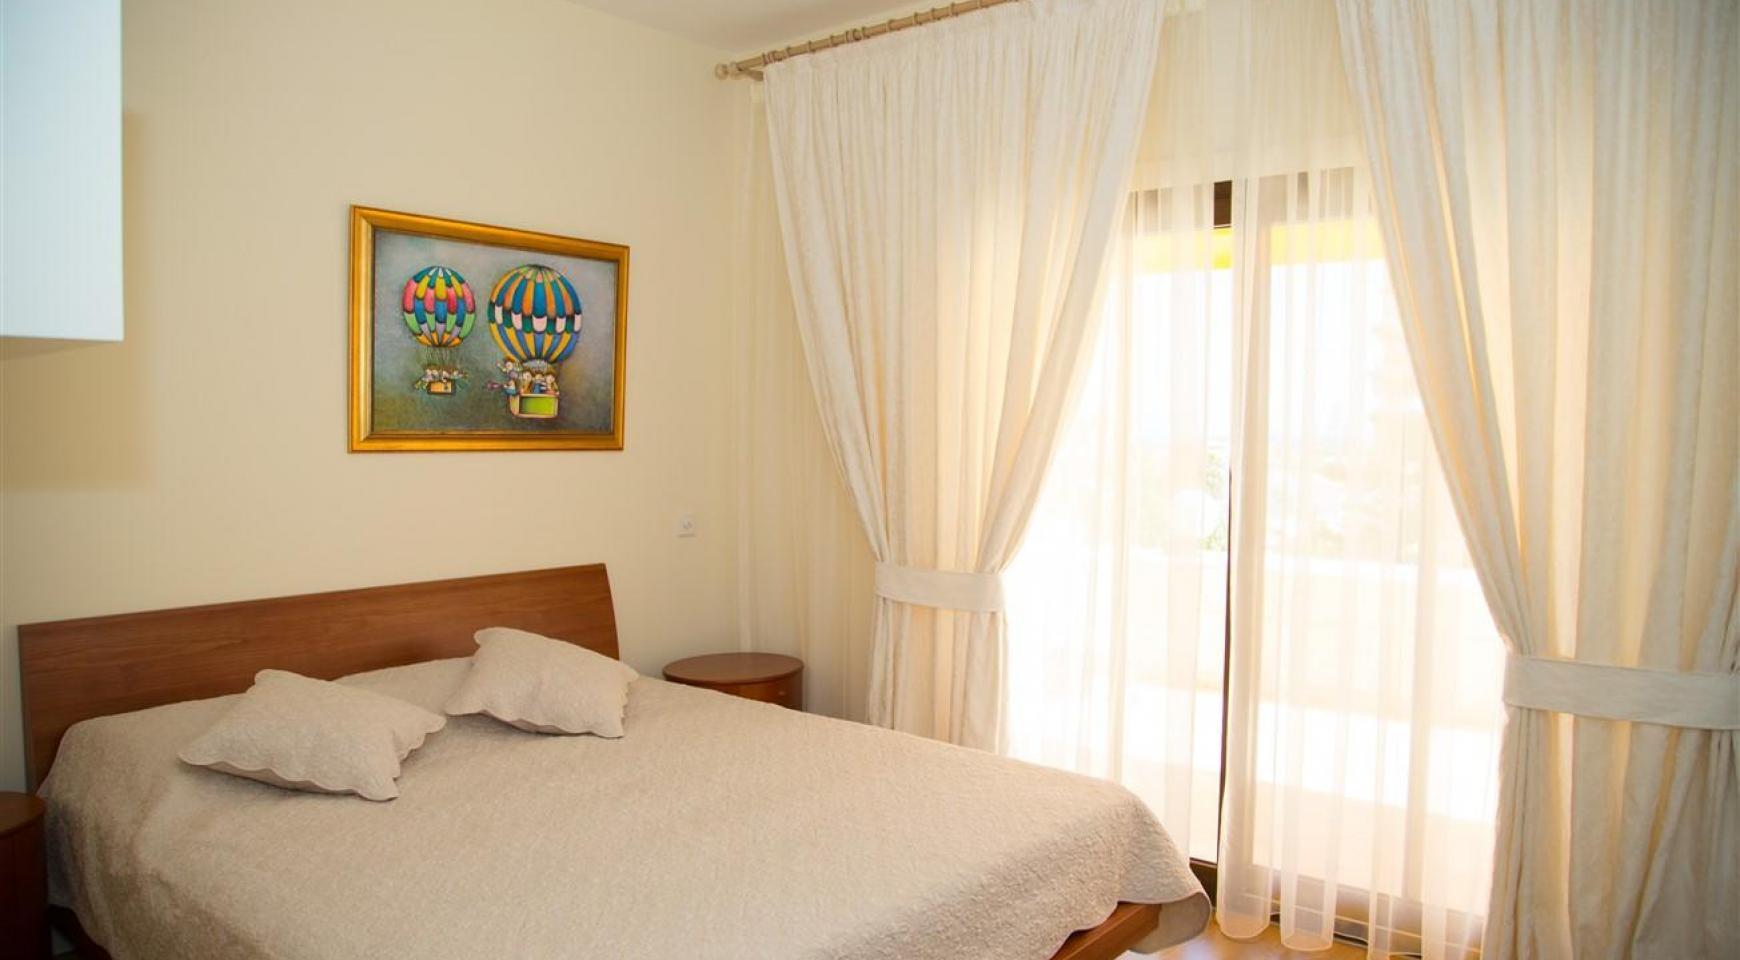 3-Спальная Квартира на Берегу Моря в Комплексе Thera   - 28